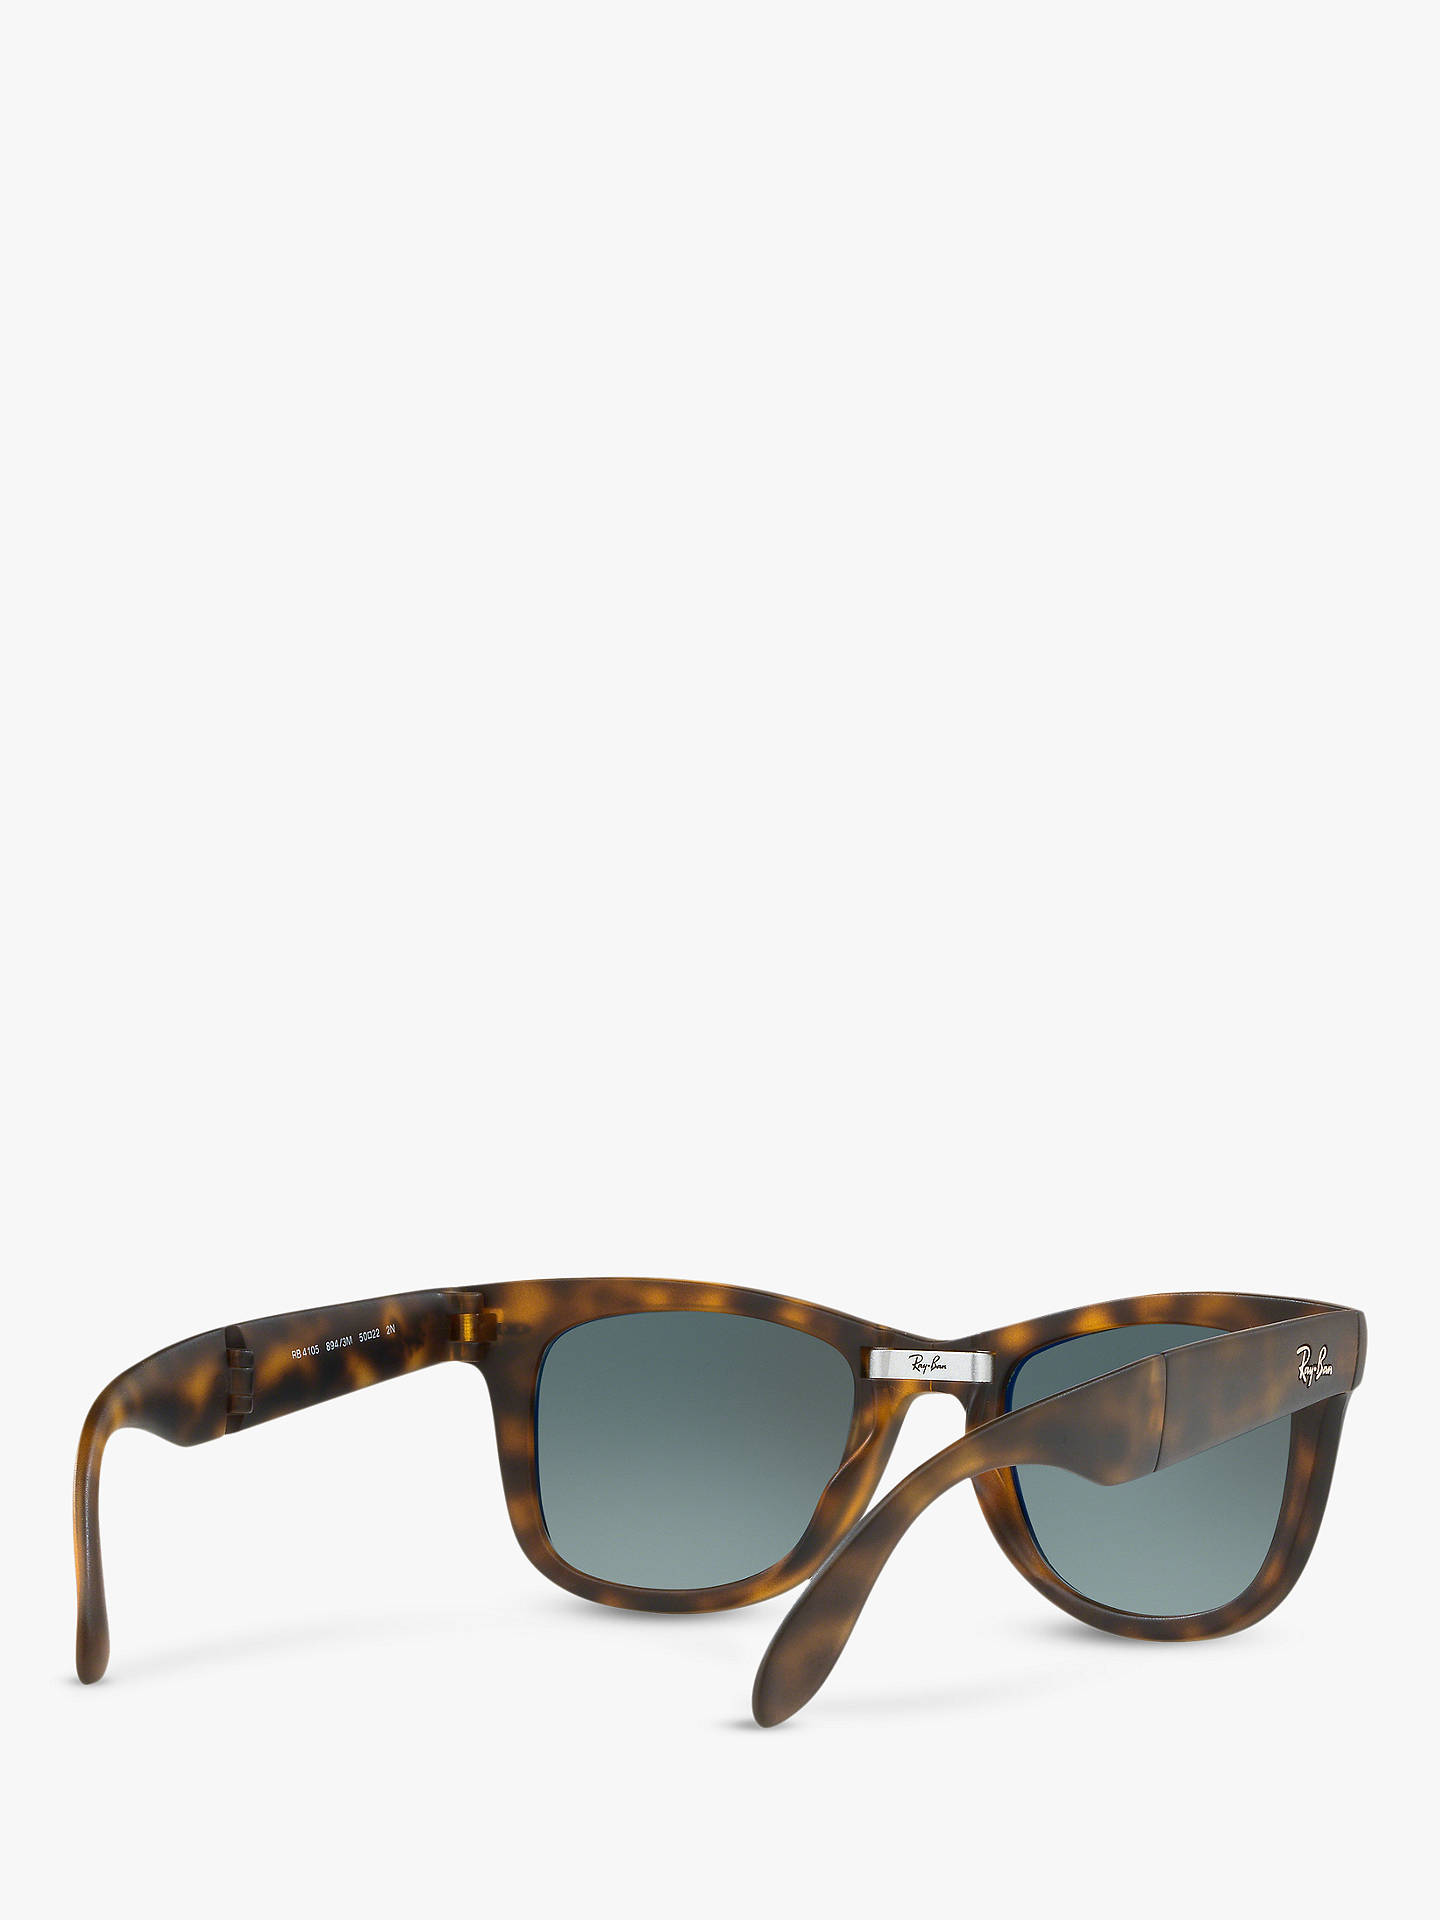 72c51027e6 ... BuyRay-Ban RB4105 Men s Folding Wayfarer Sunglasses